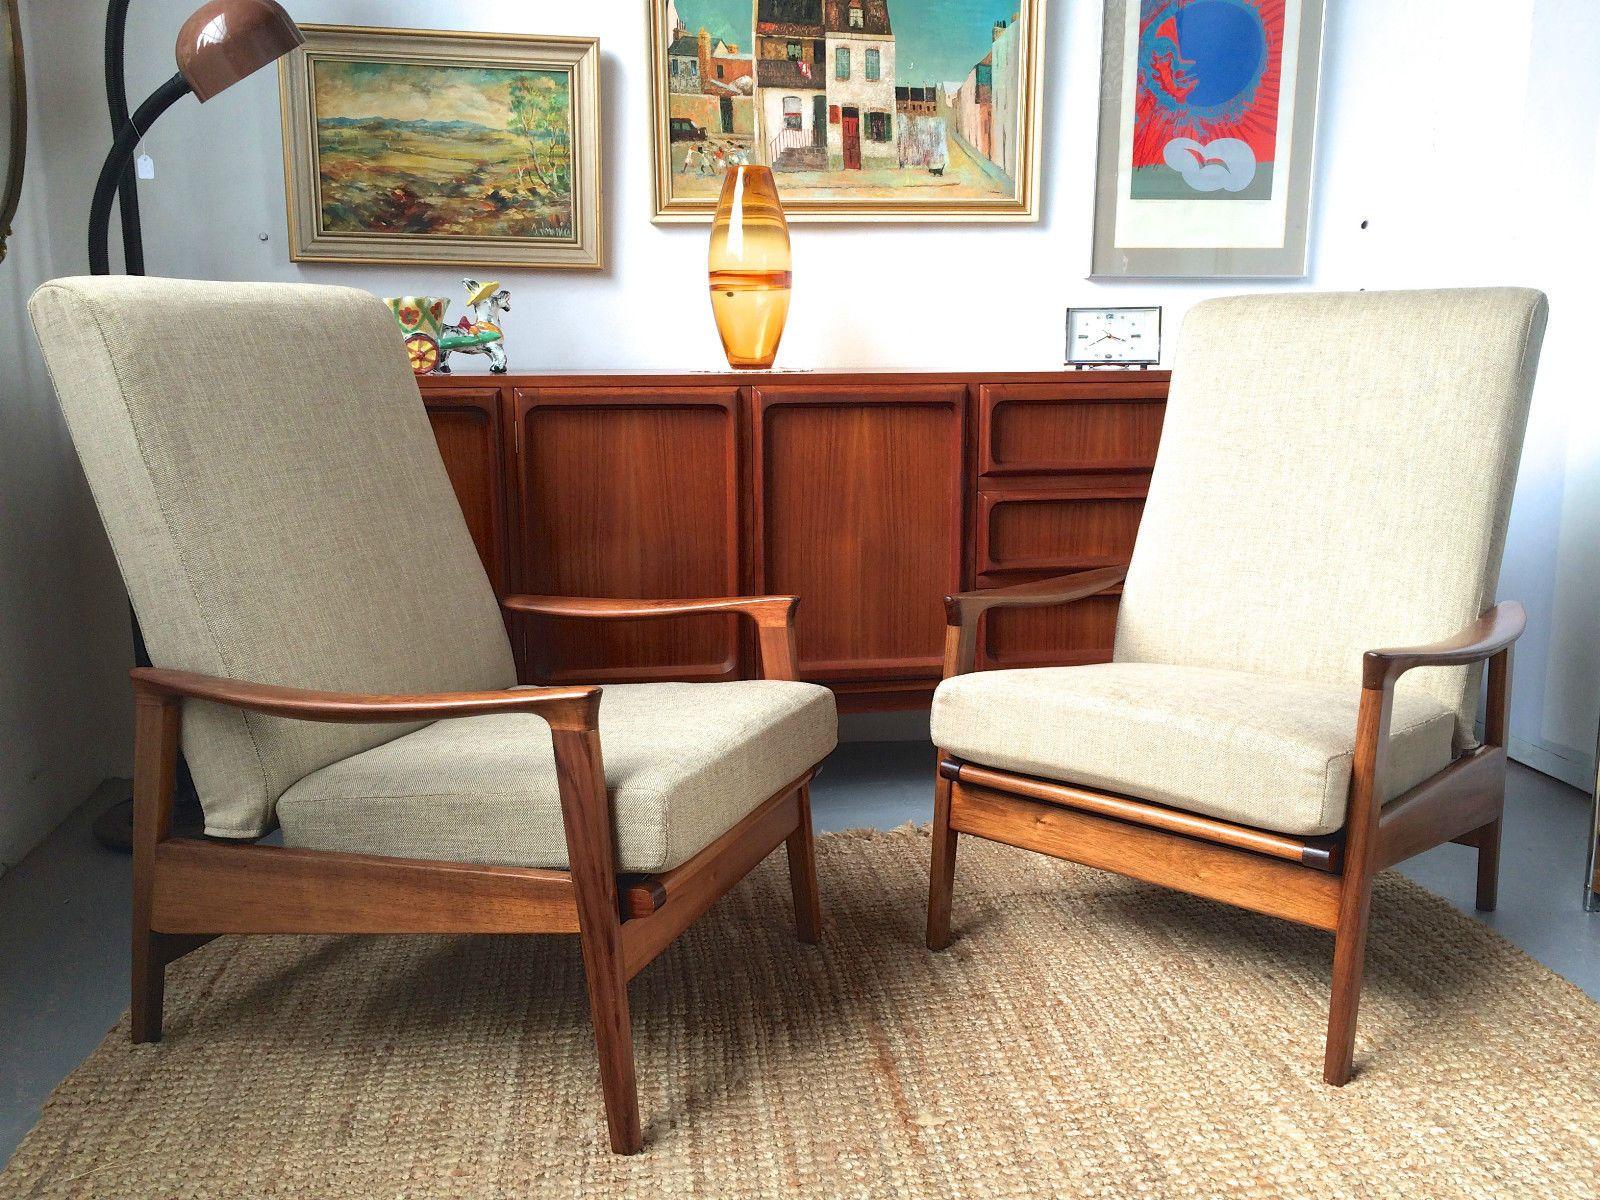 2 X Blackwood Parker Recliners Retro Funk And Junk Mid Century Armchair Armchair Vintage Parker Furniture